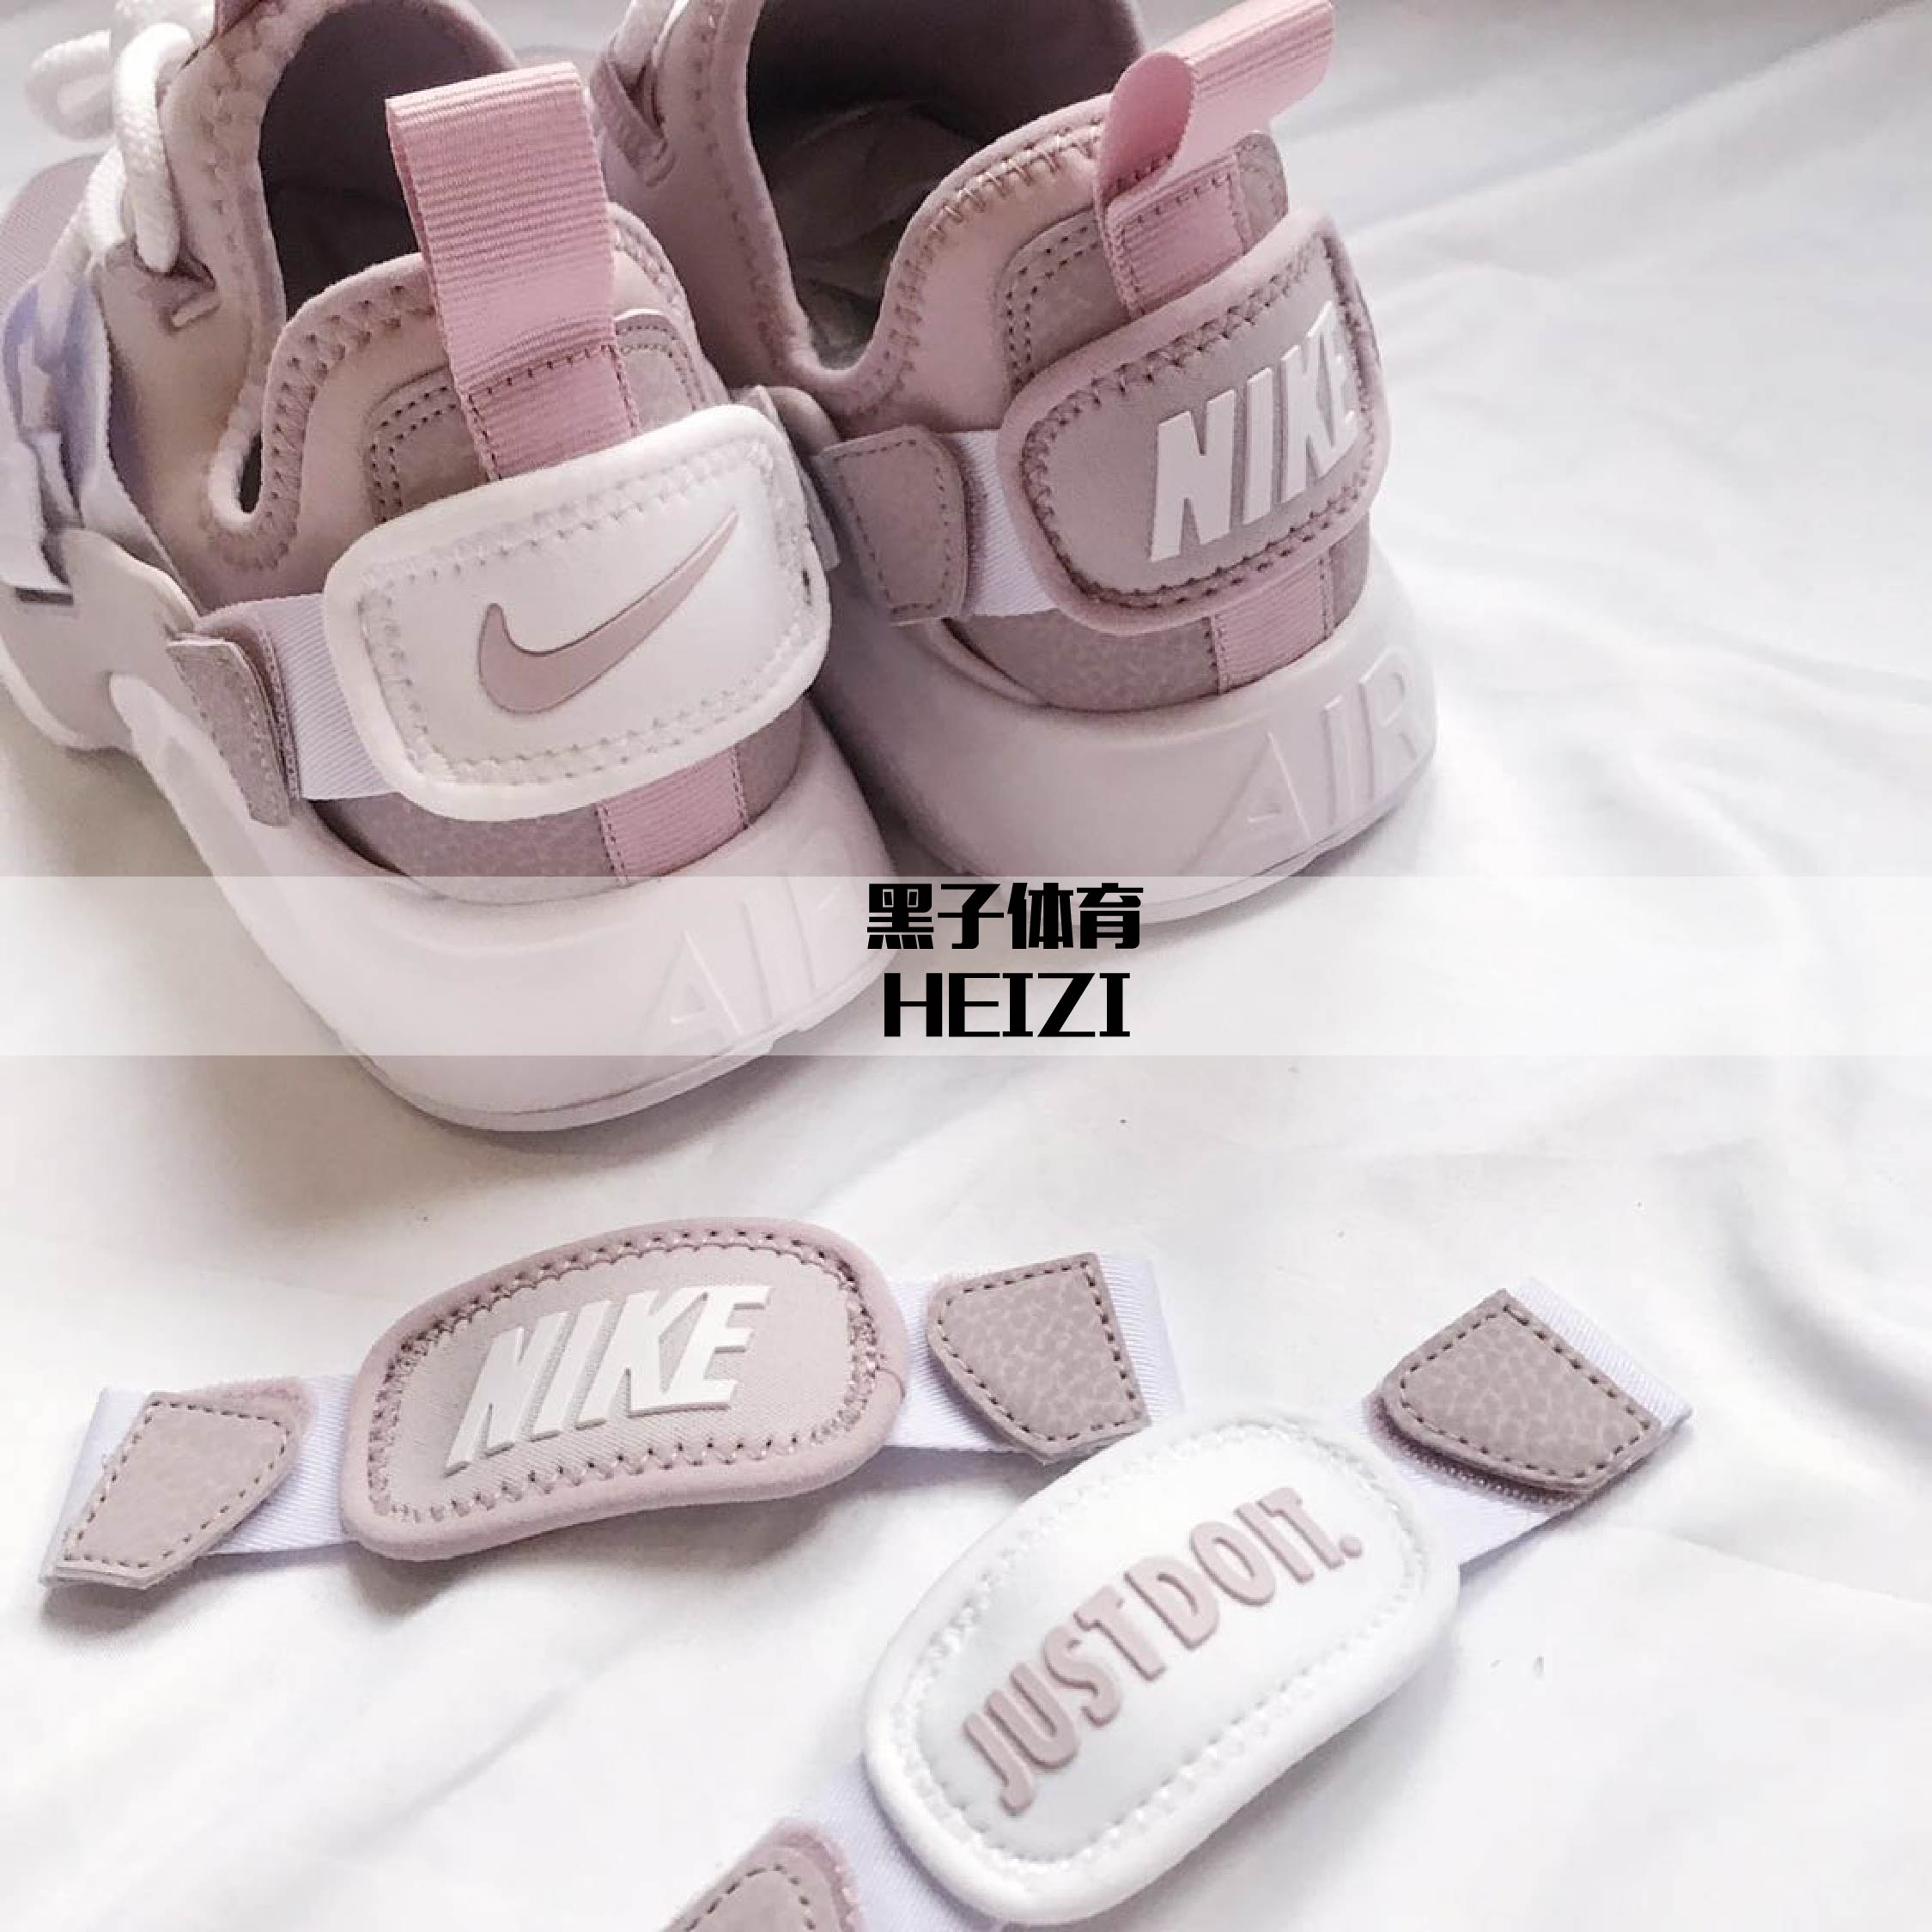 Nike耐克HuaracheCity耐克华莱士卡其樱花粉女鞋纯白ah6804